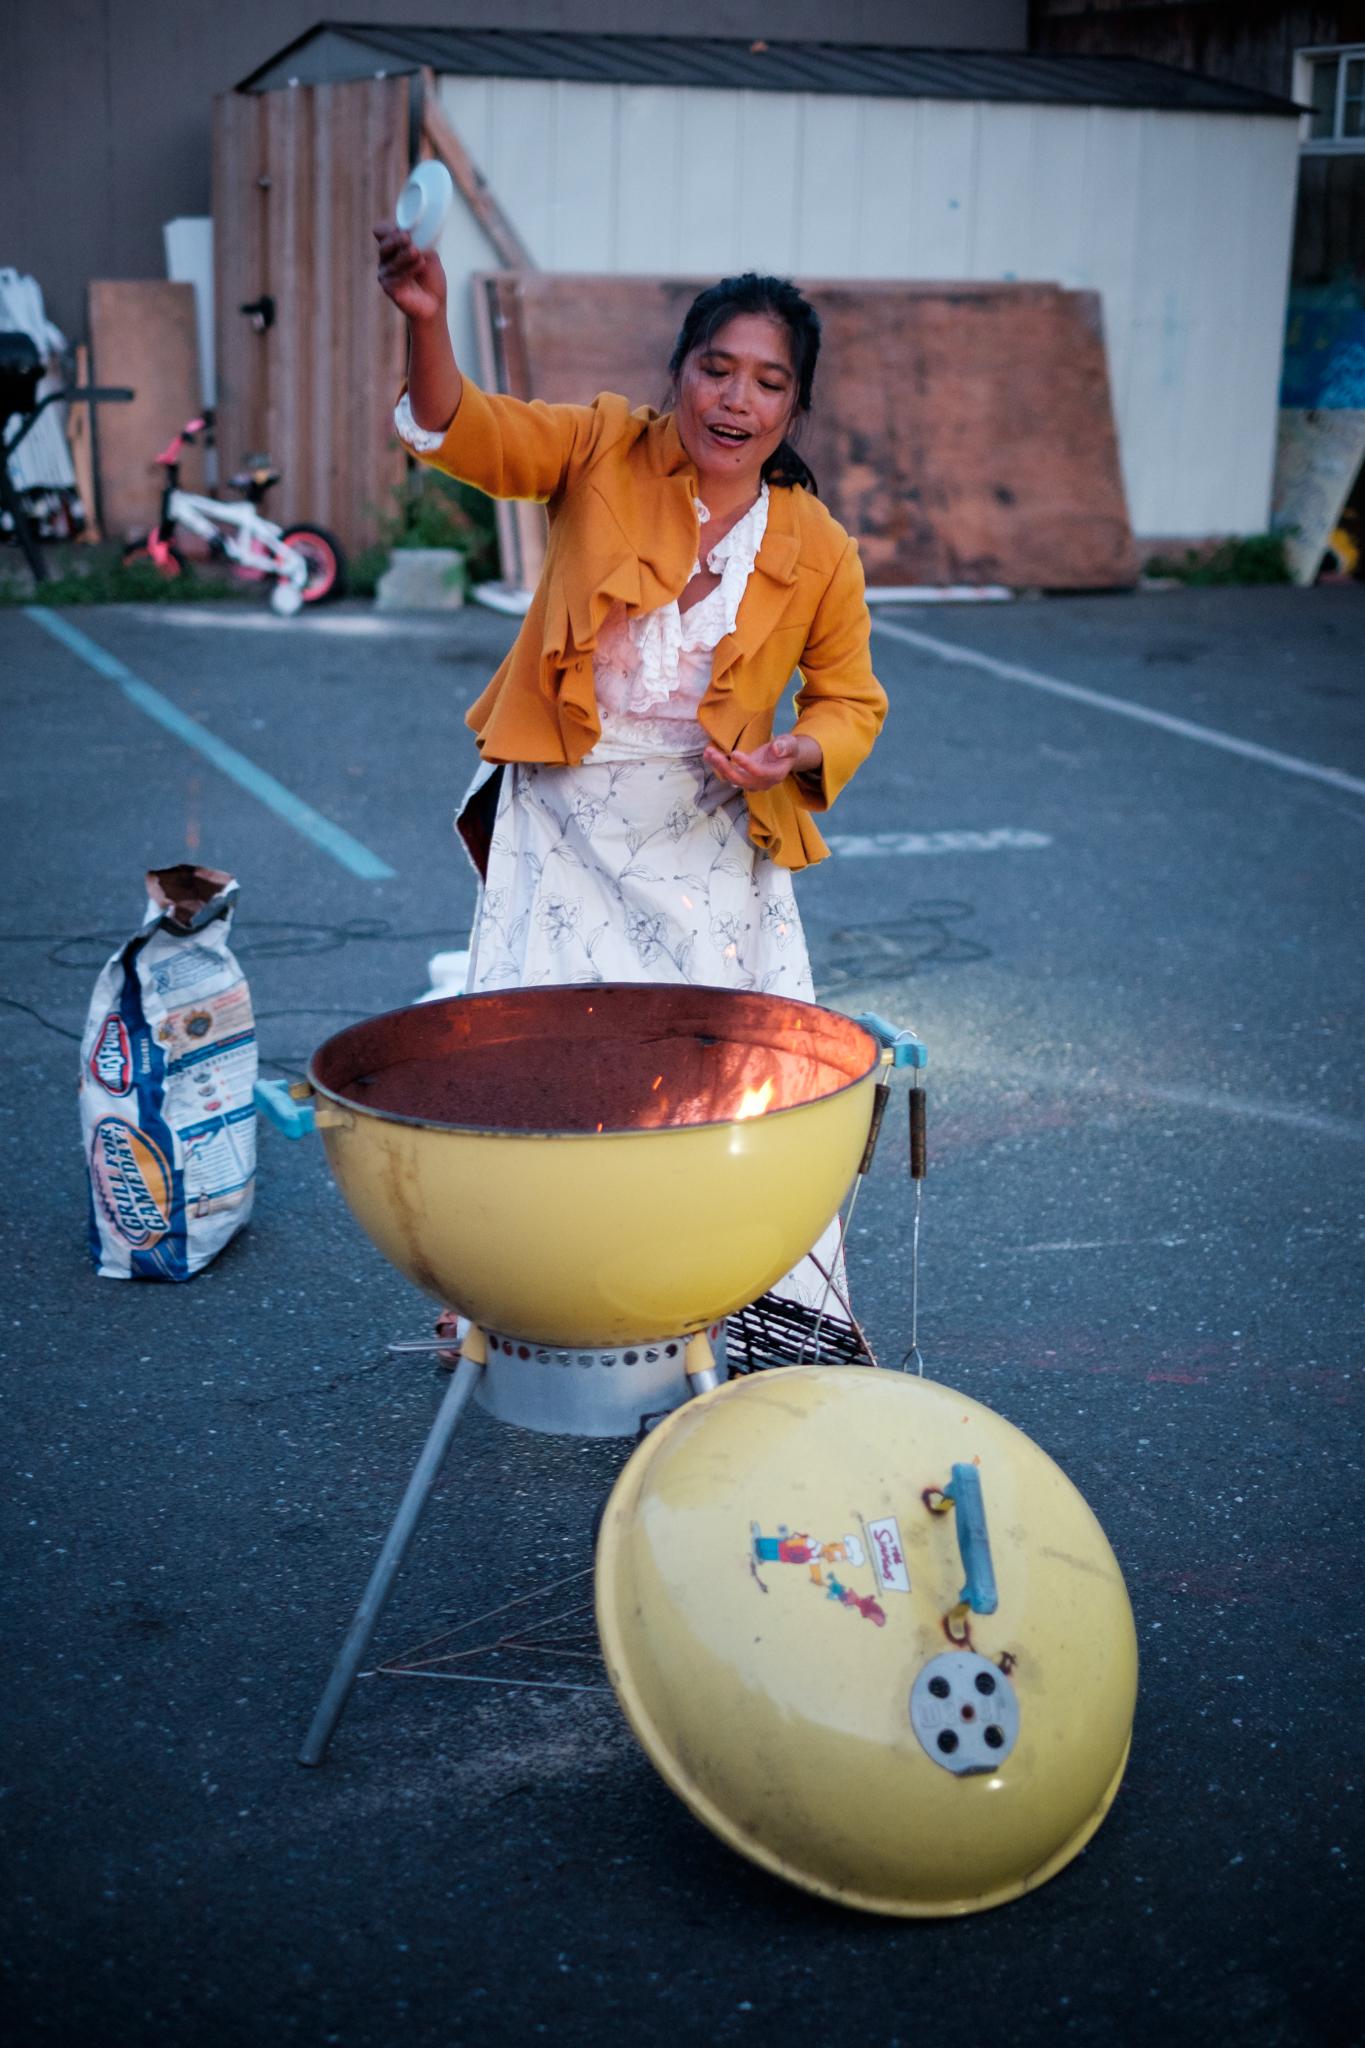 Pearl Ubungen in ESCC parking lot, photo by Scott Tsuchitani (click to enlarge)